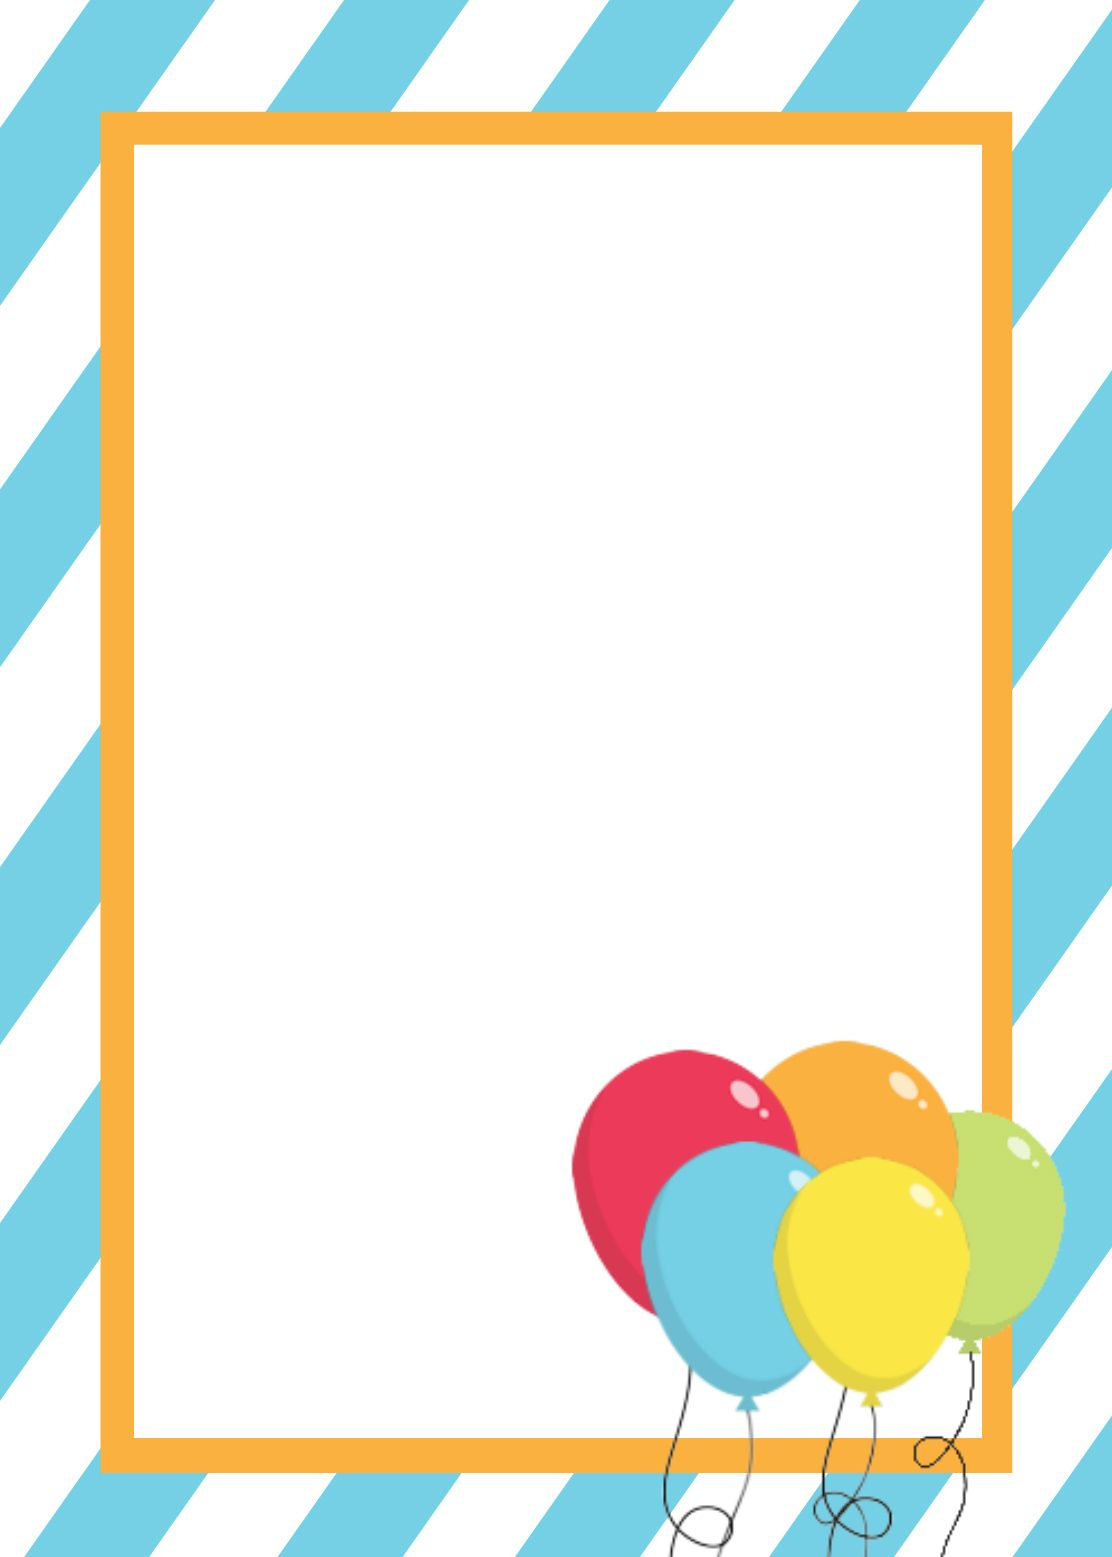 Free Printable Birthday Invitation Templates | Birthday Ideas And - Free Printable Party Invitations